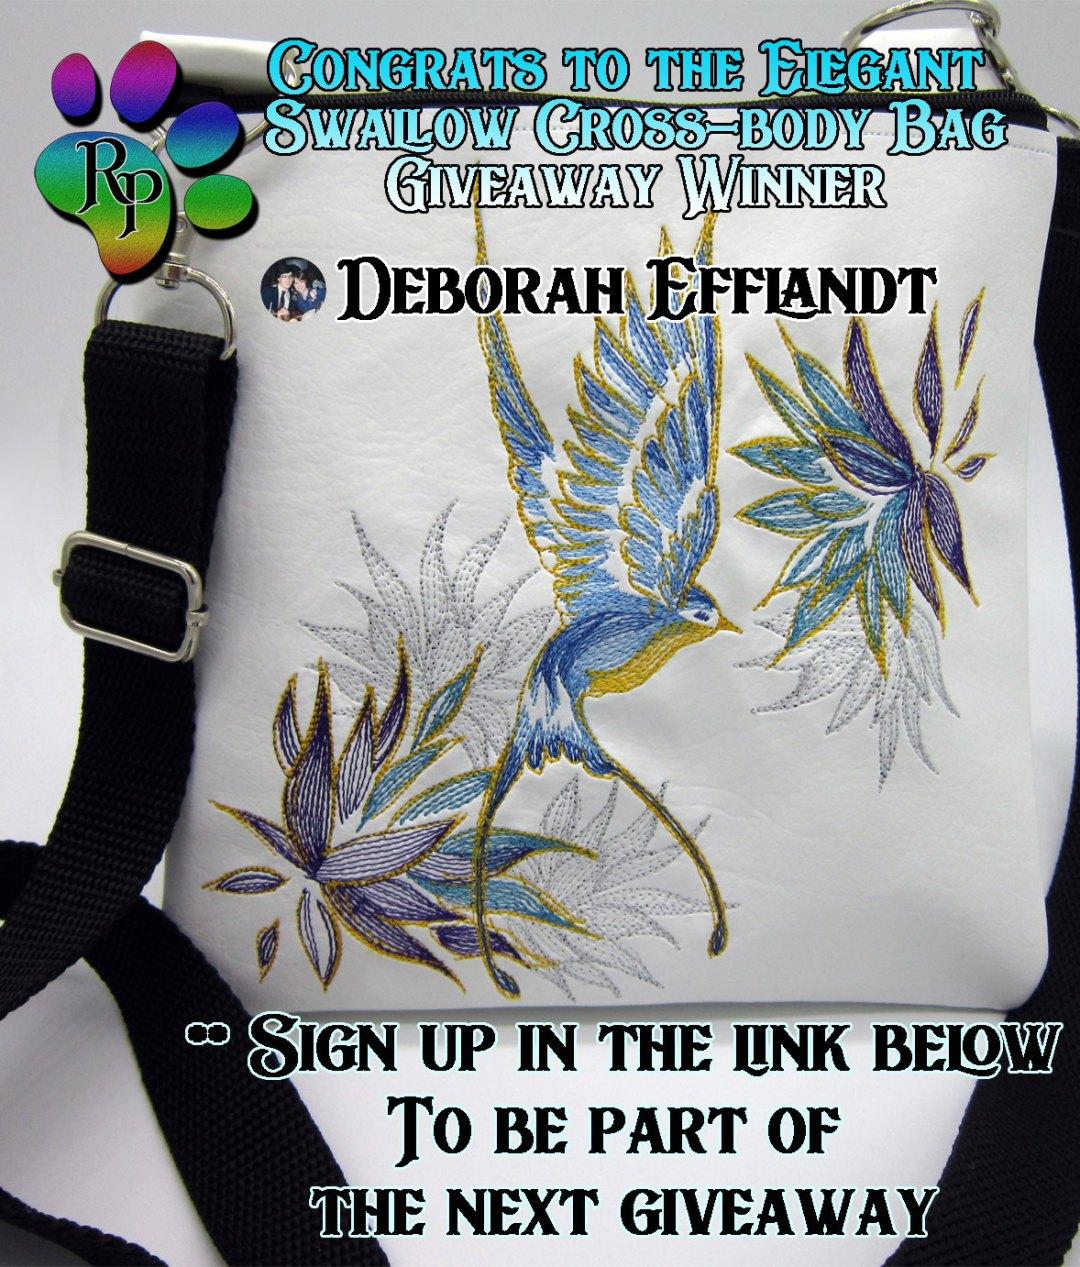 Elegant Swallow Giveaway Winner